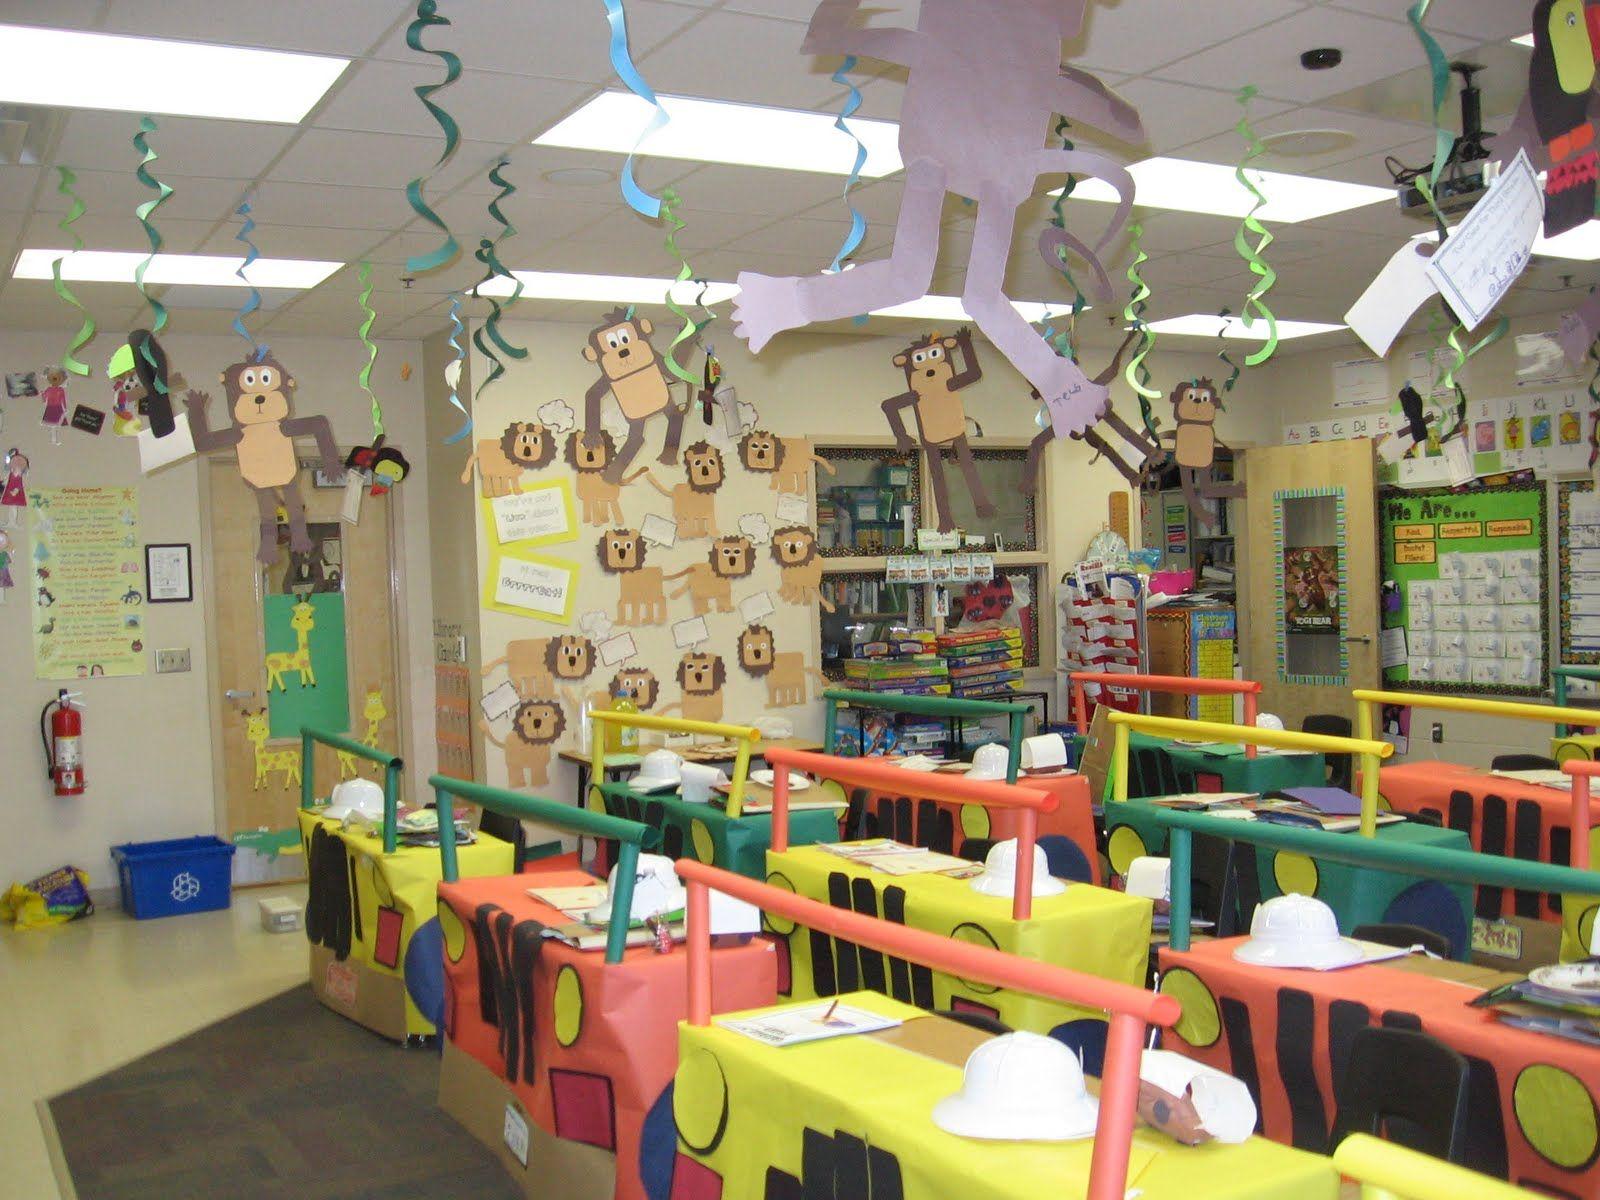 Safari Classroom Decoration I Love How The Teacher Turned The Desks Into Jeeps